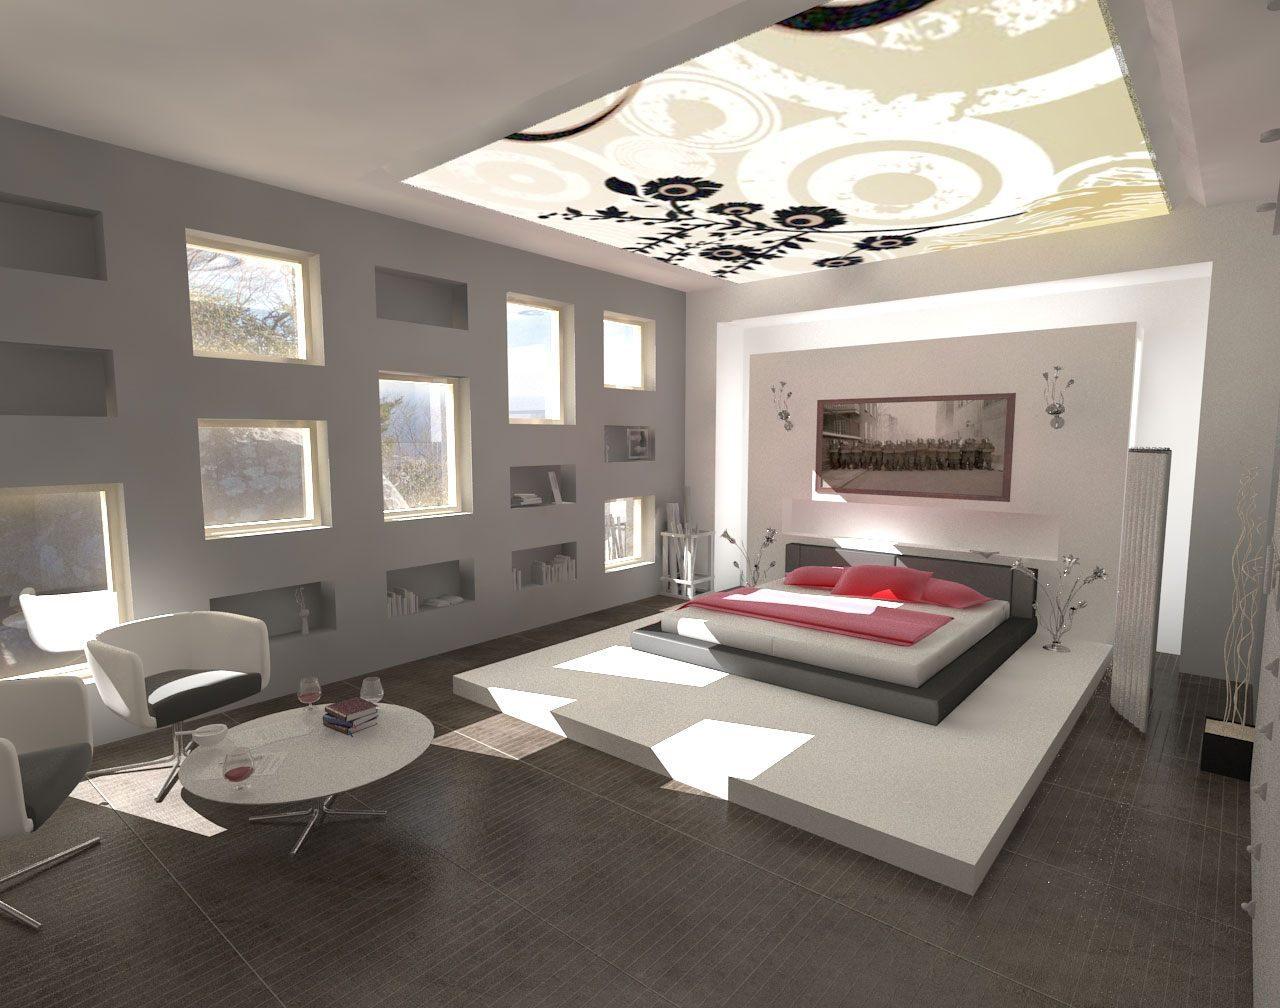 habitaciones modernas - Buhardillas Modernas